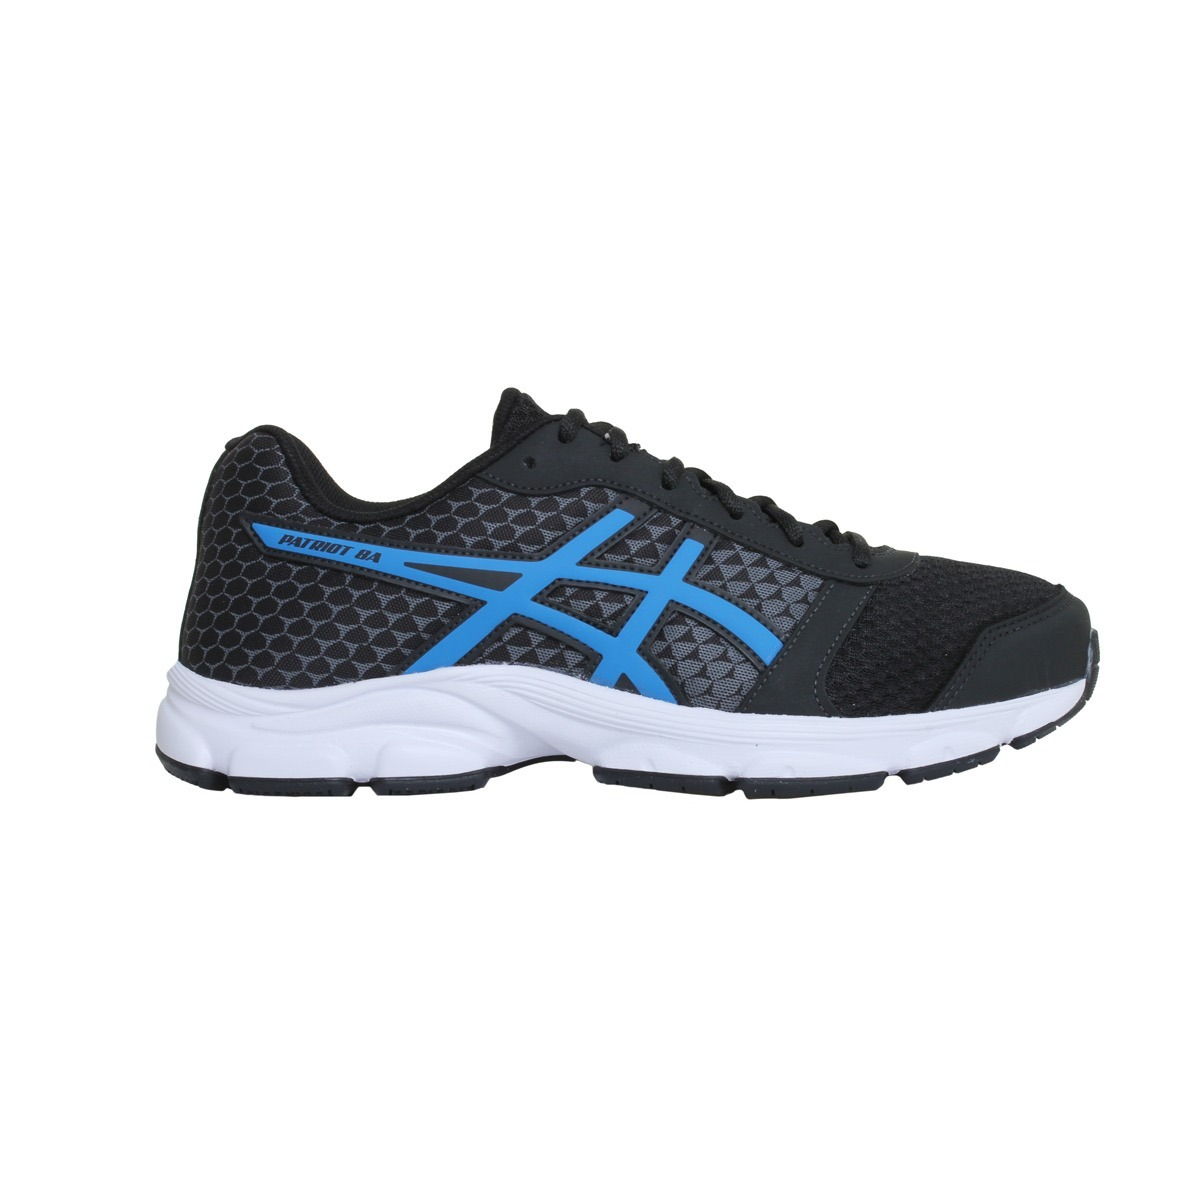 89d17258c oferta zapatillas asics gel patriot 8 de hombre para running · zapatillas  asics hombre. Cargando zoom.